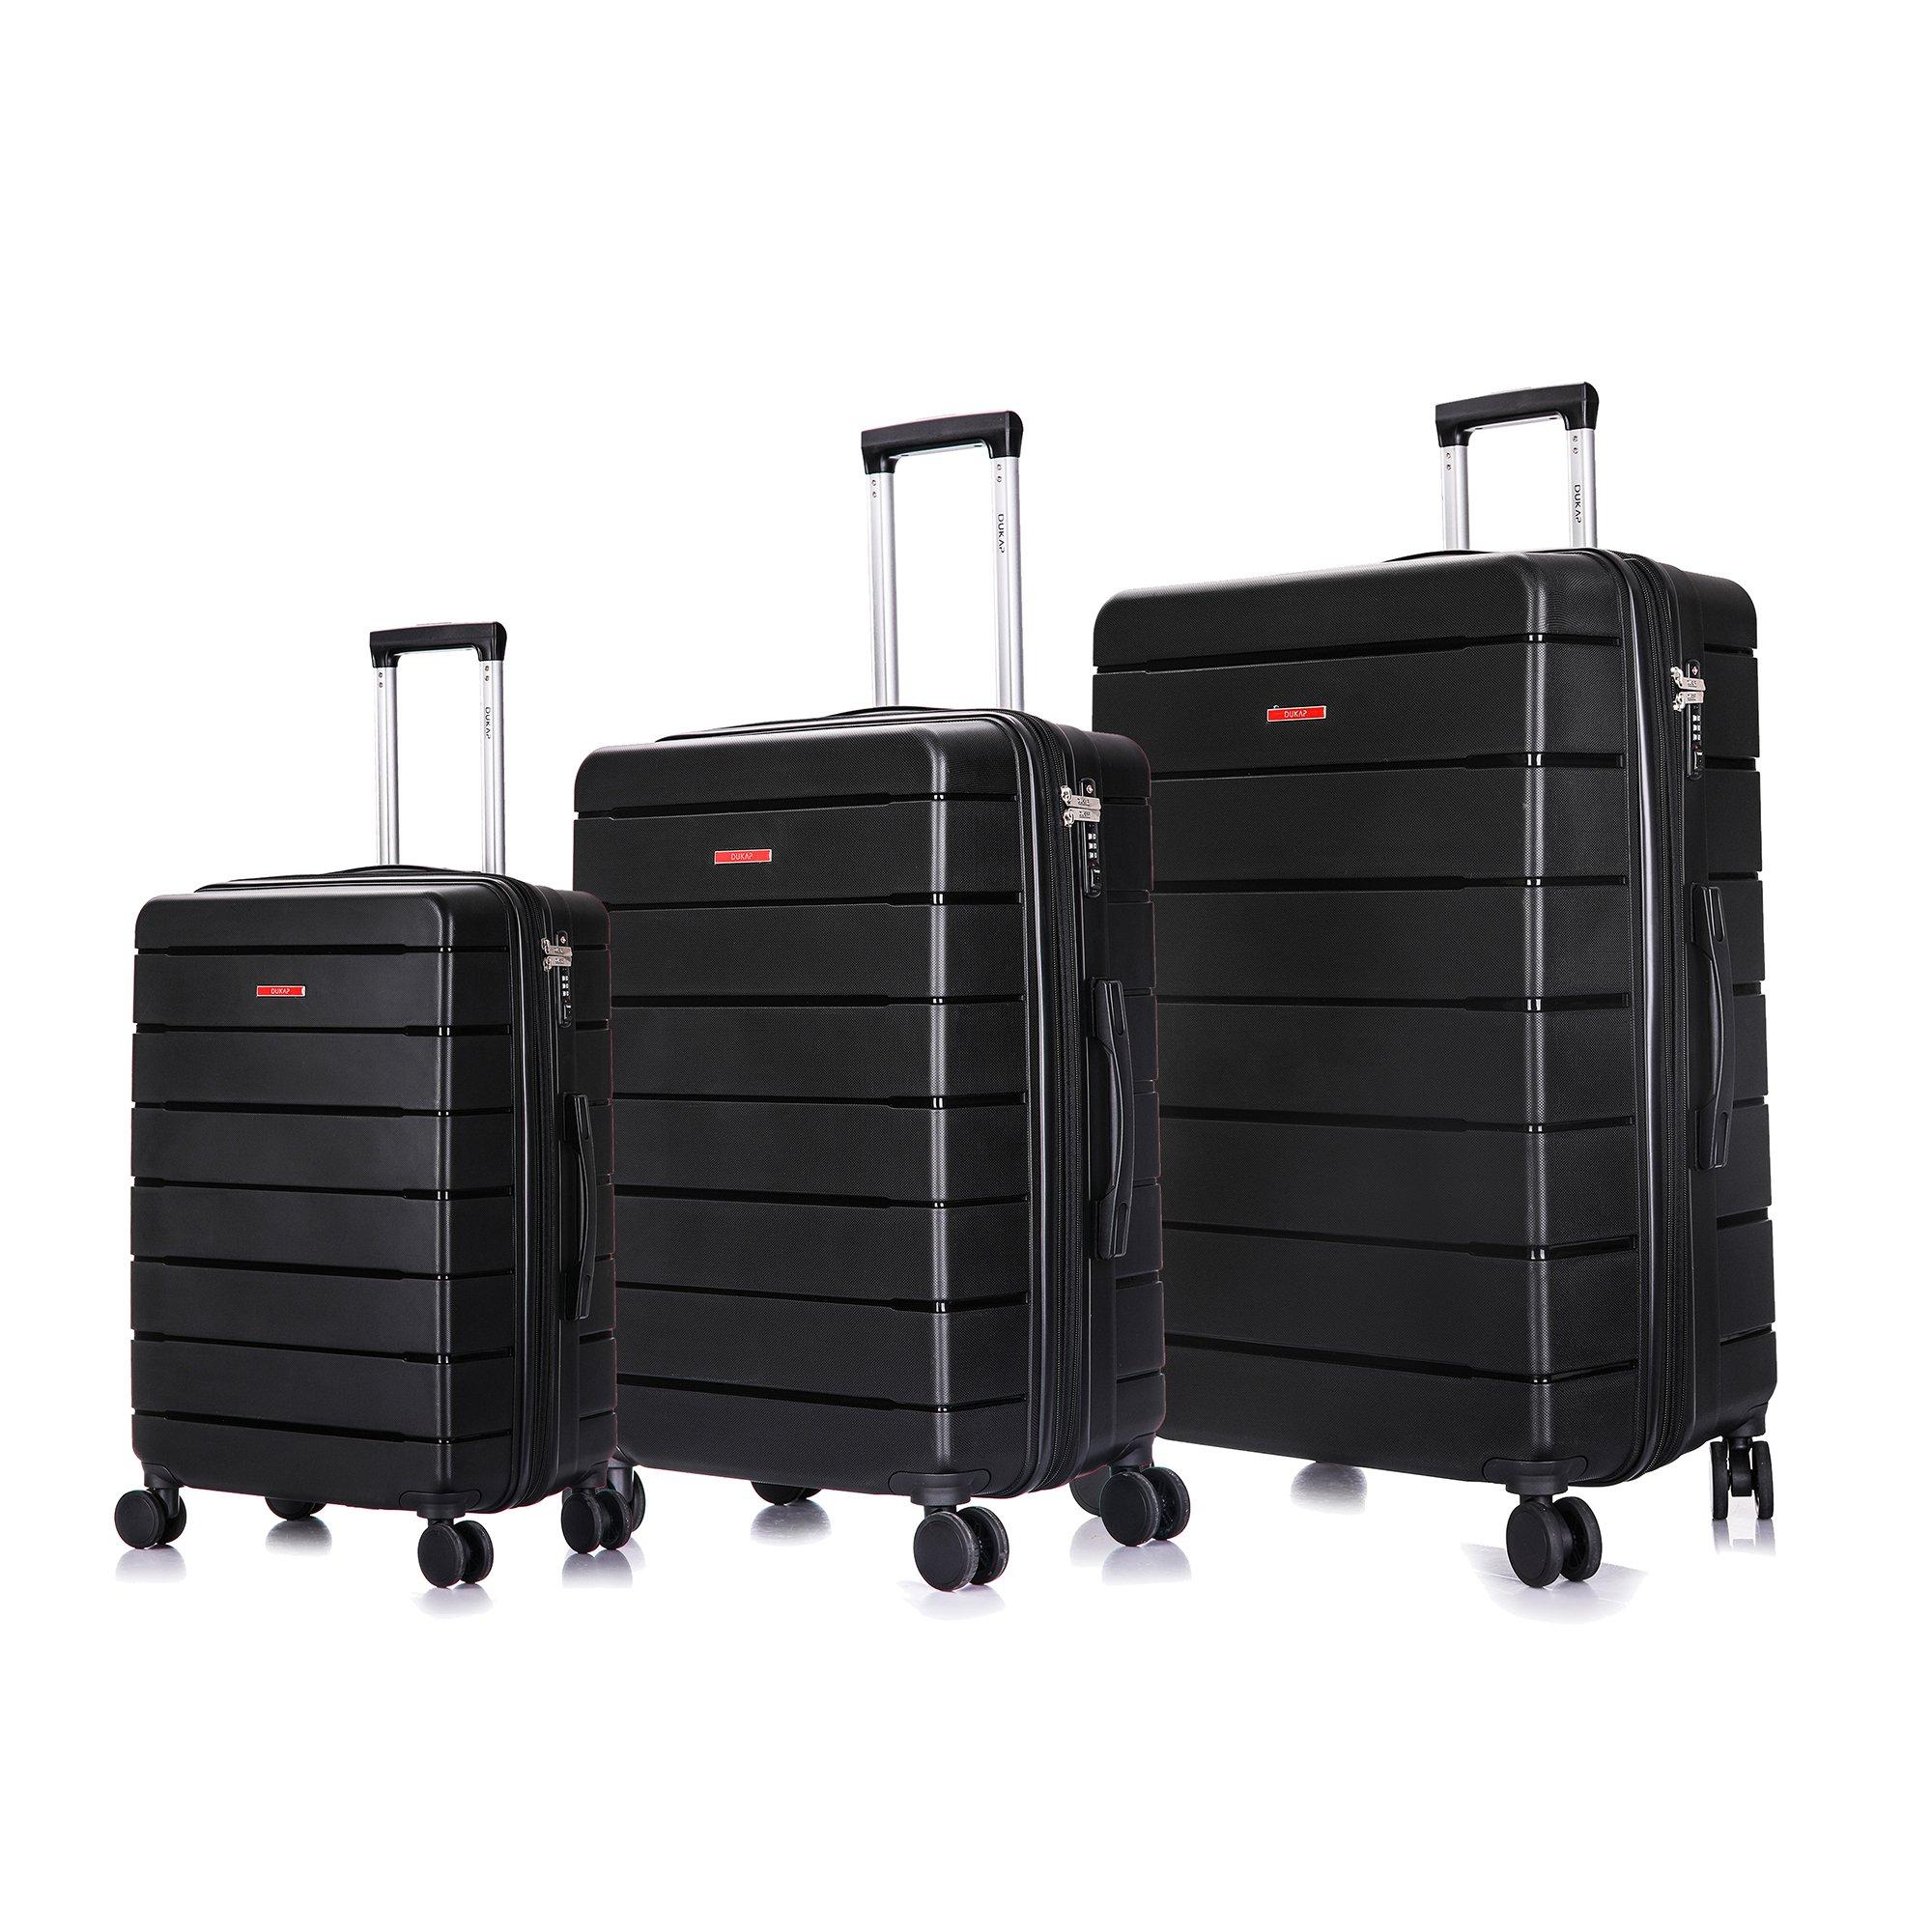 7da7e8aaf4f8 DUKAP Definity - 3-Piece Large Lightweight Durable Polypropylene Hardside  Spinner Expandable Luggage Set 20